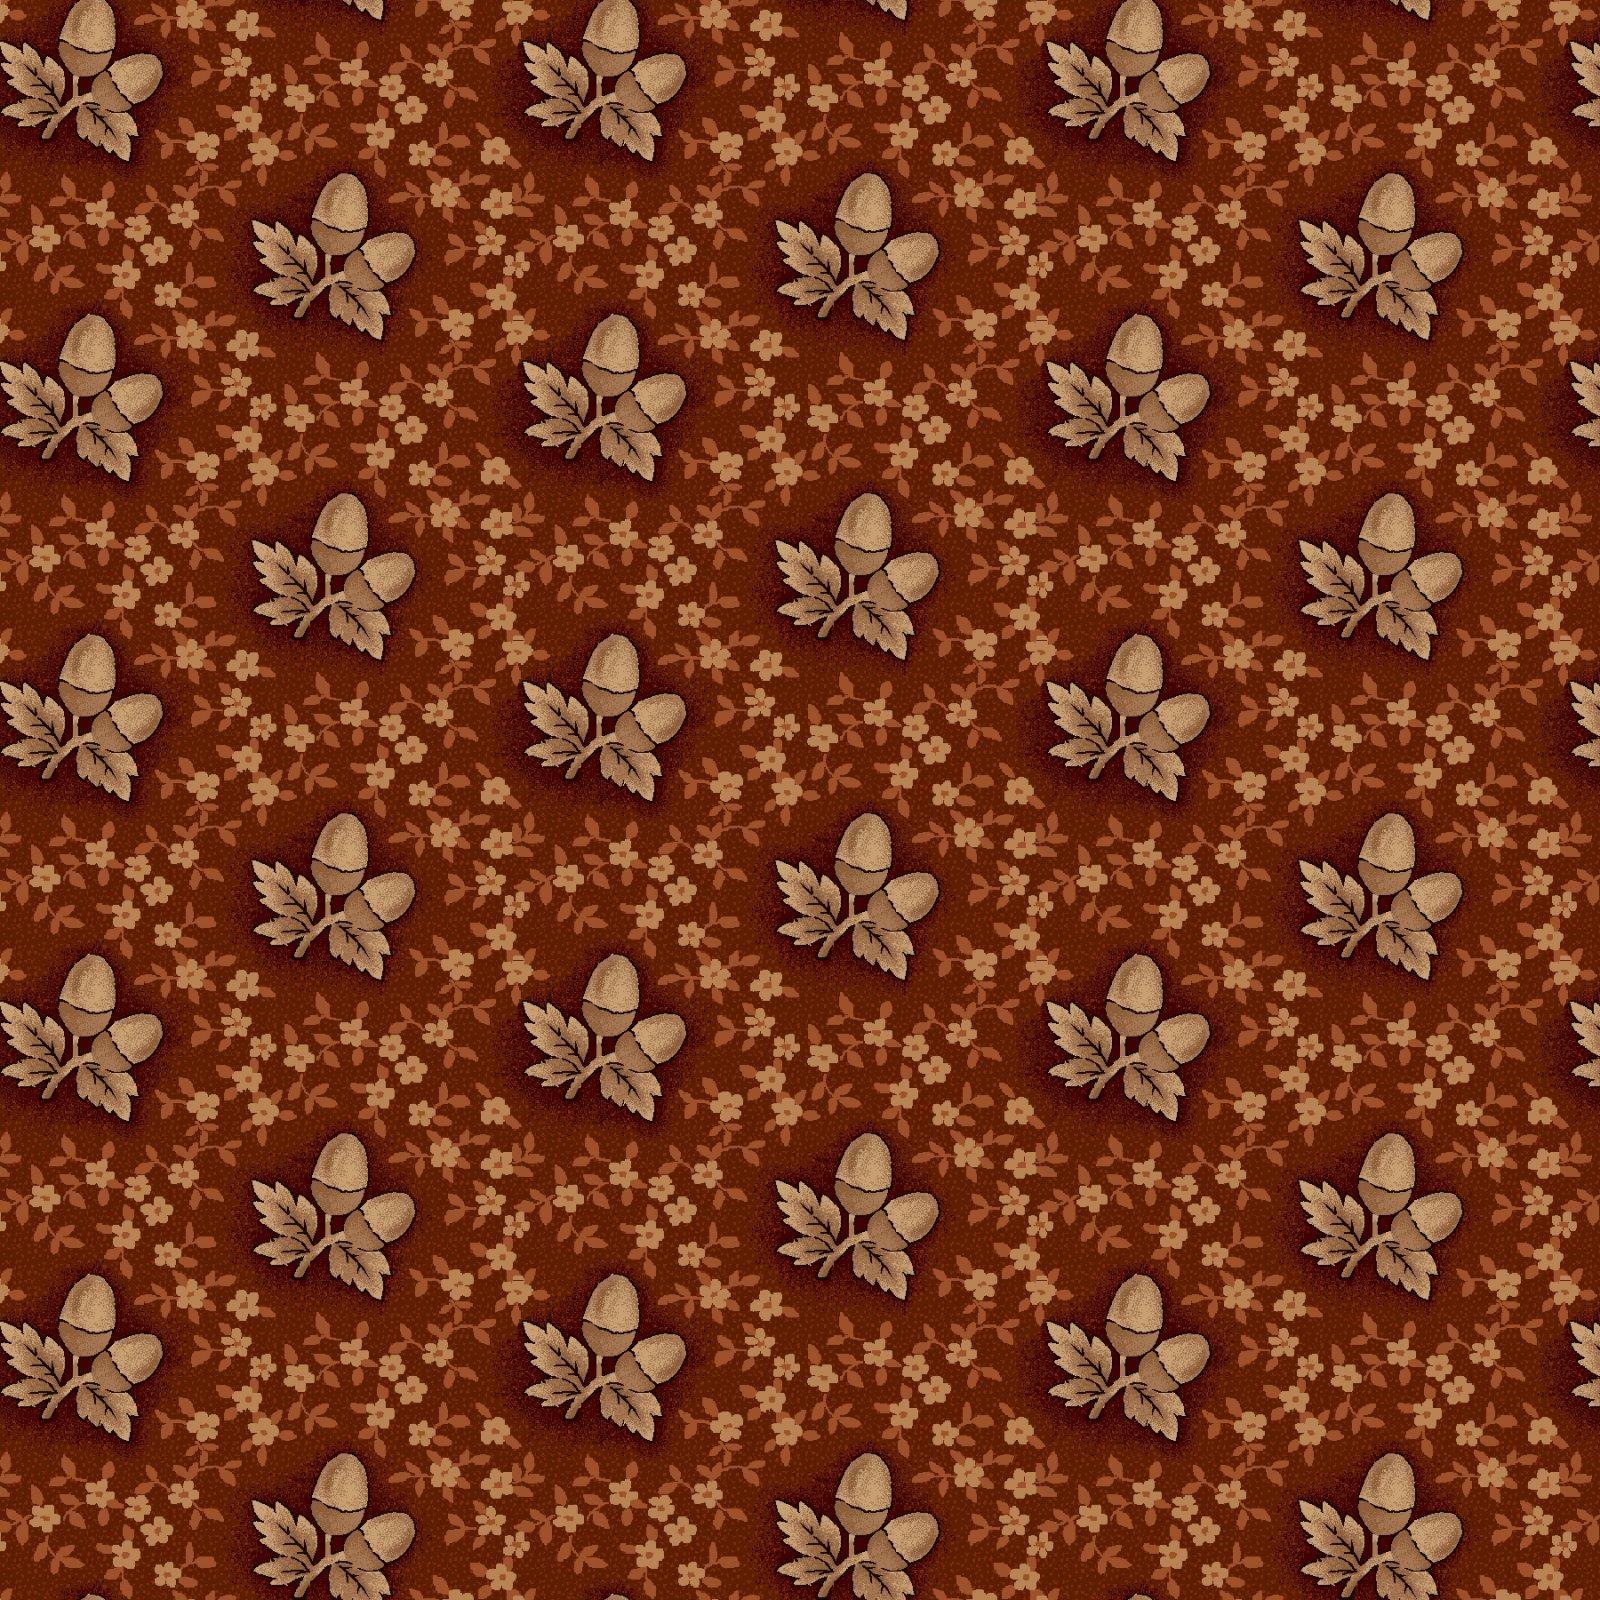 Buttermilk Autumn - 2277-35 * 1/2 yard